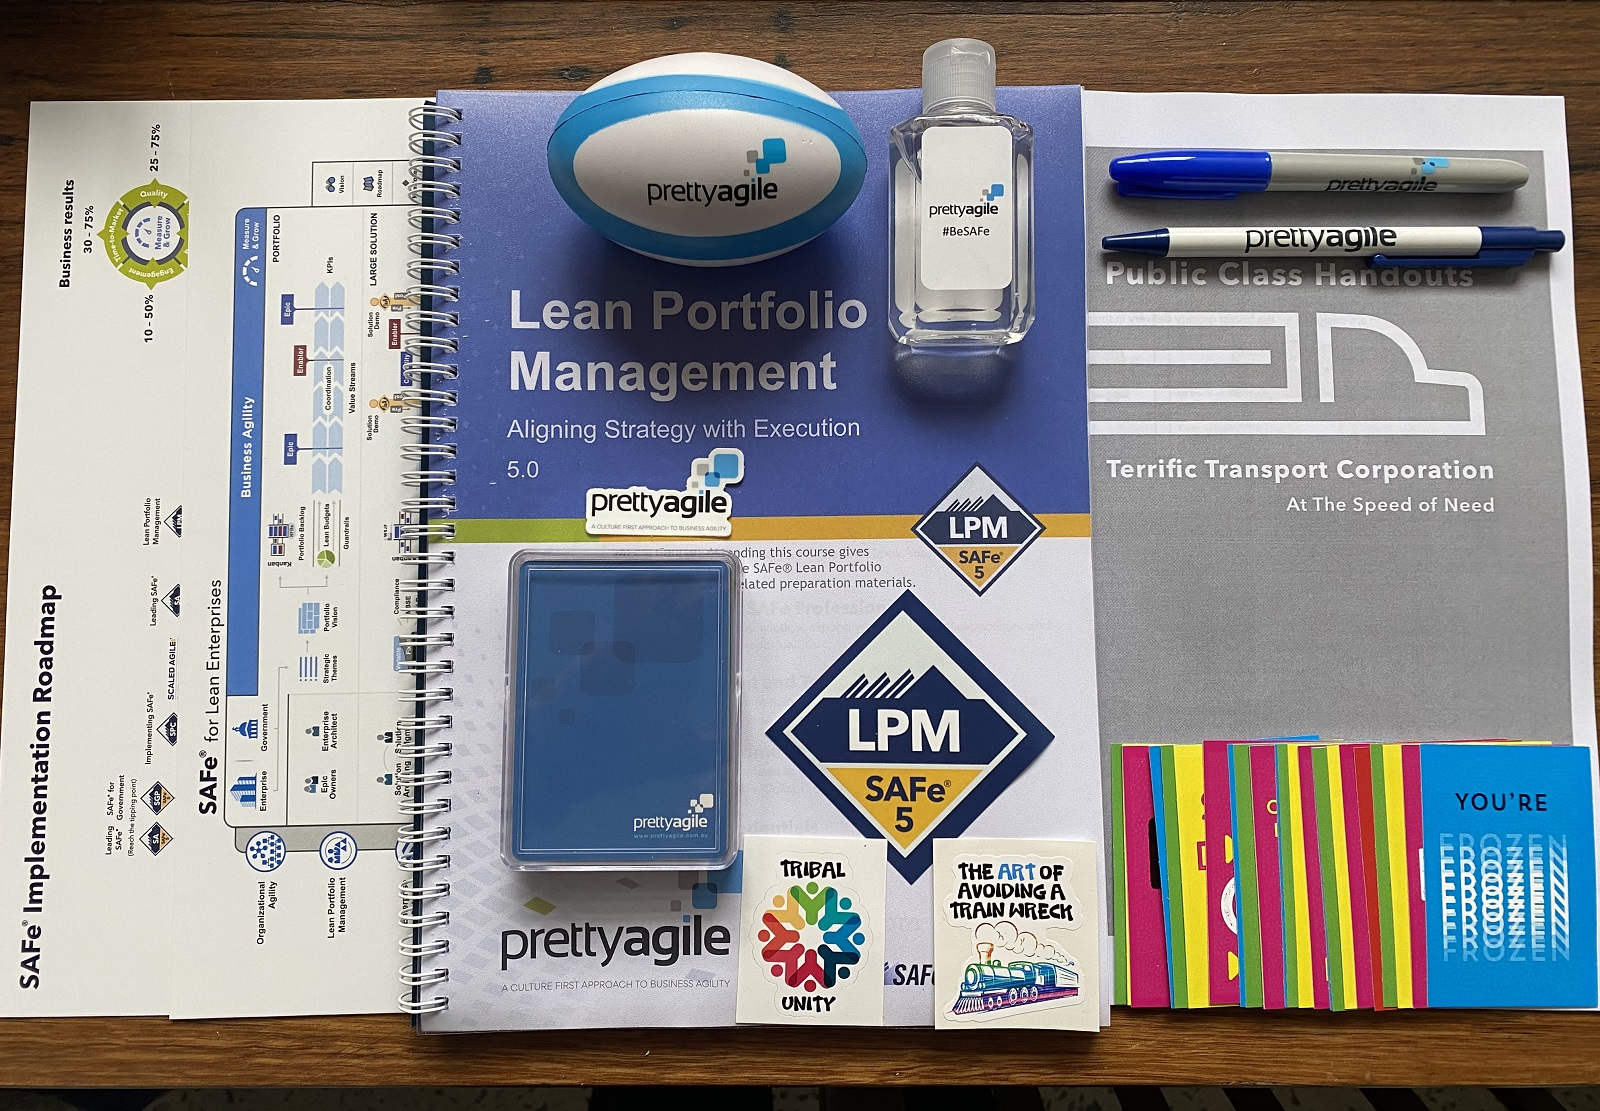 Lean Portfolio Management Training Kit